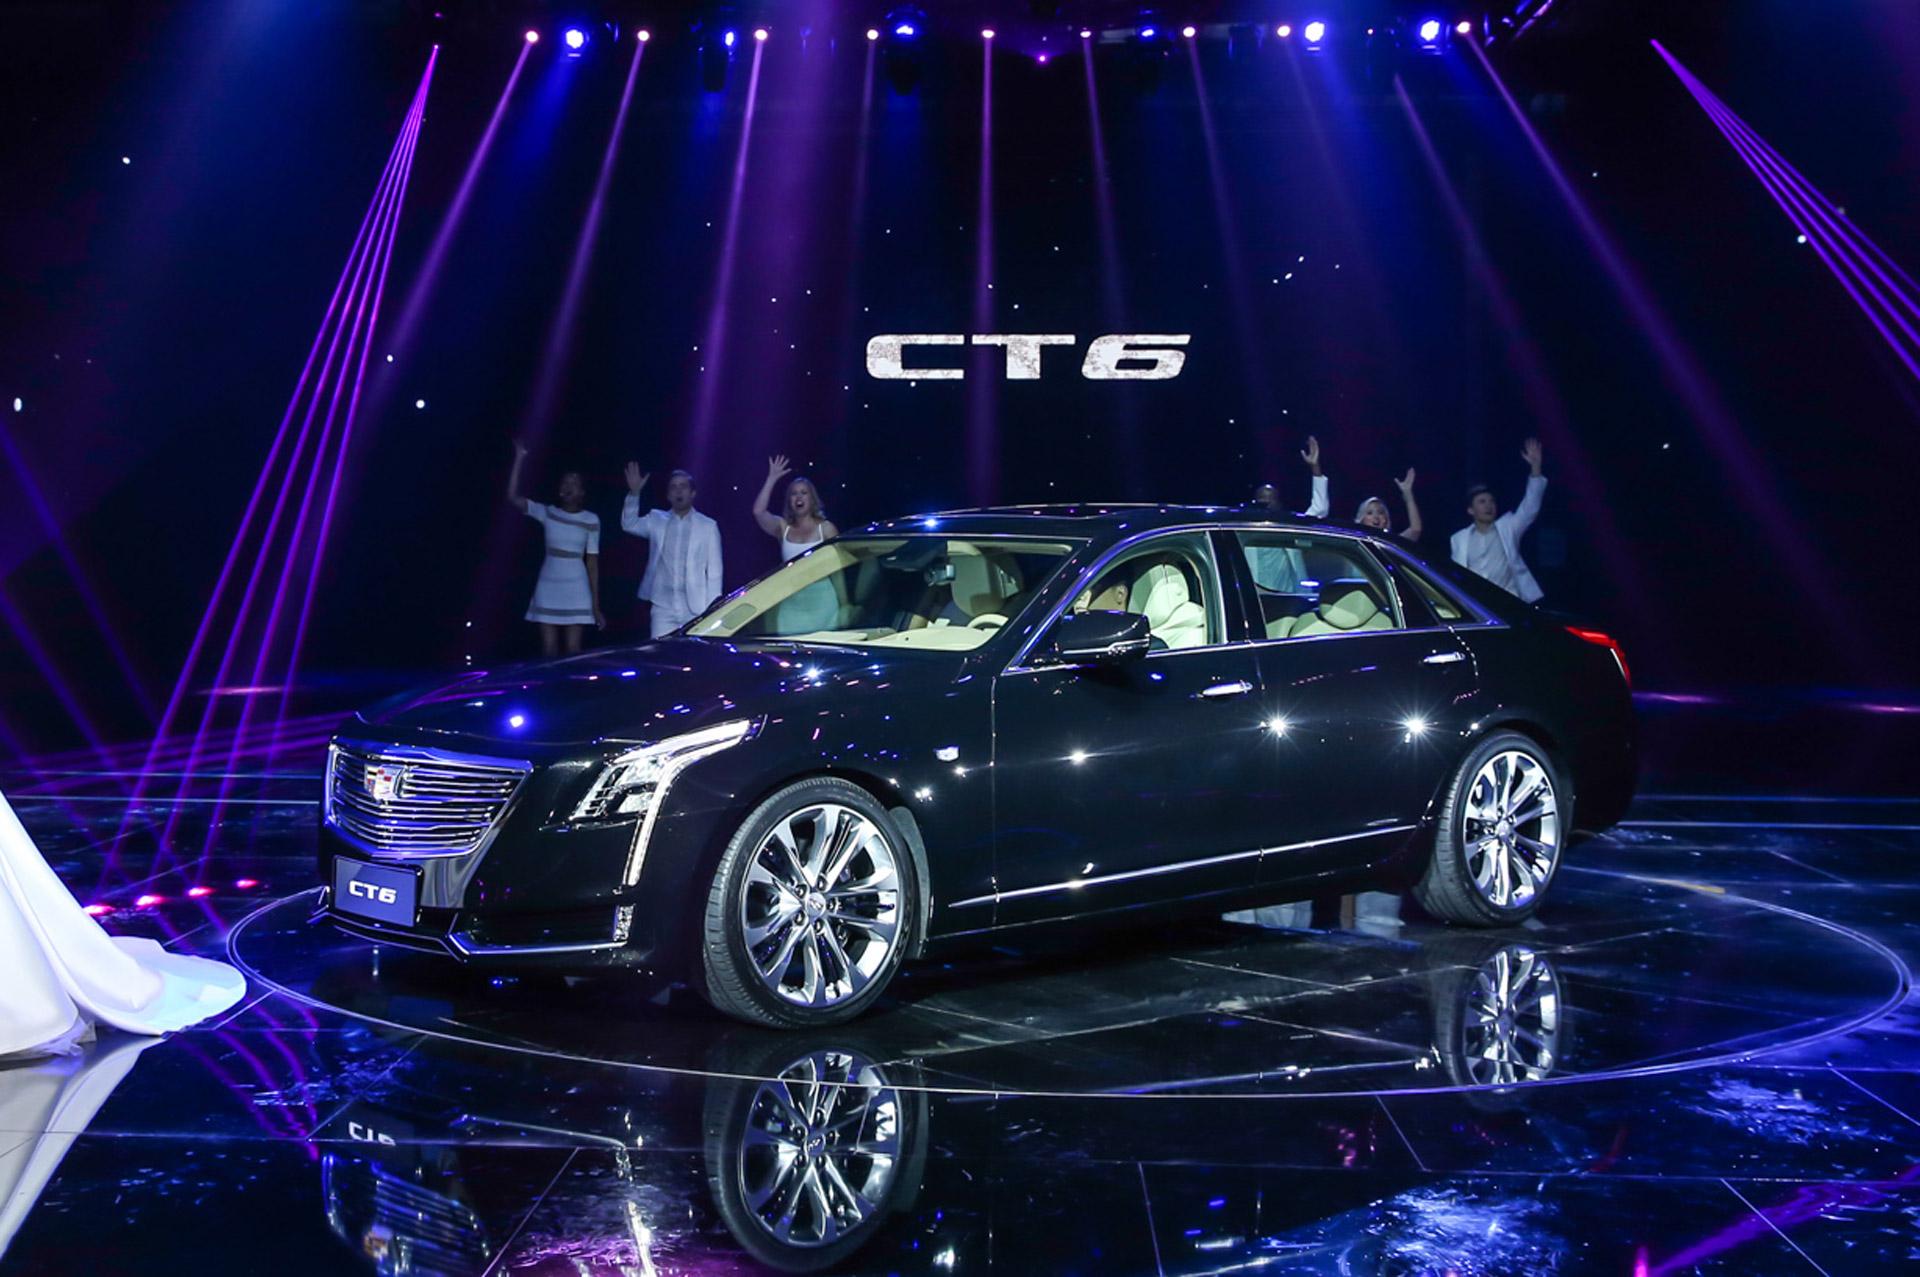 2016 Cadillac Ct6 Plug In Hybrid Debuts At 2015 Shanghai